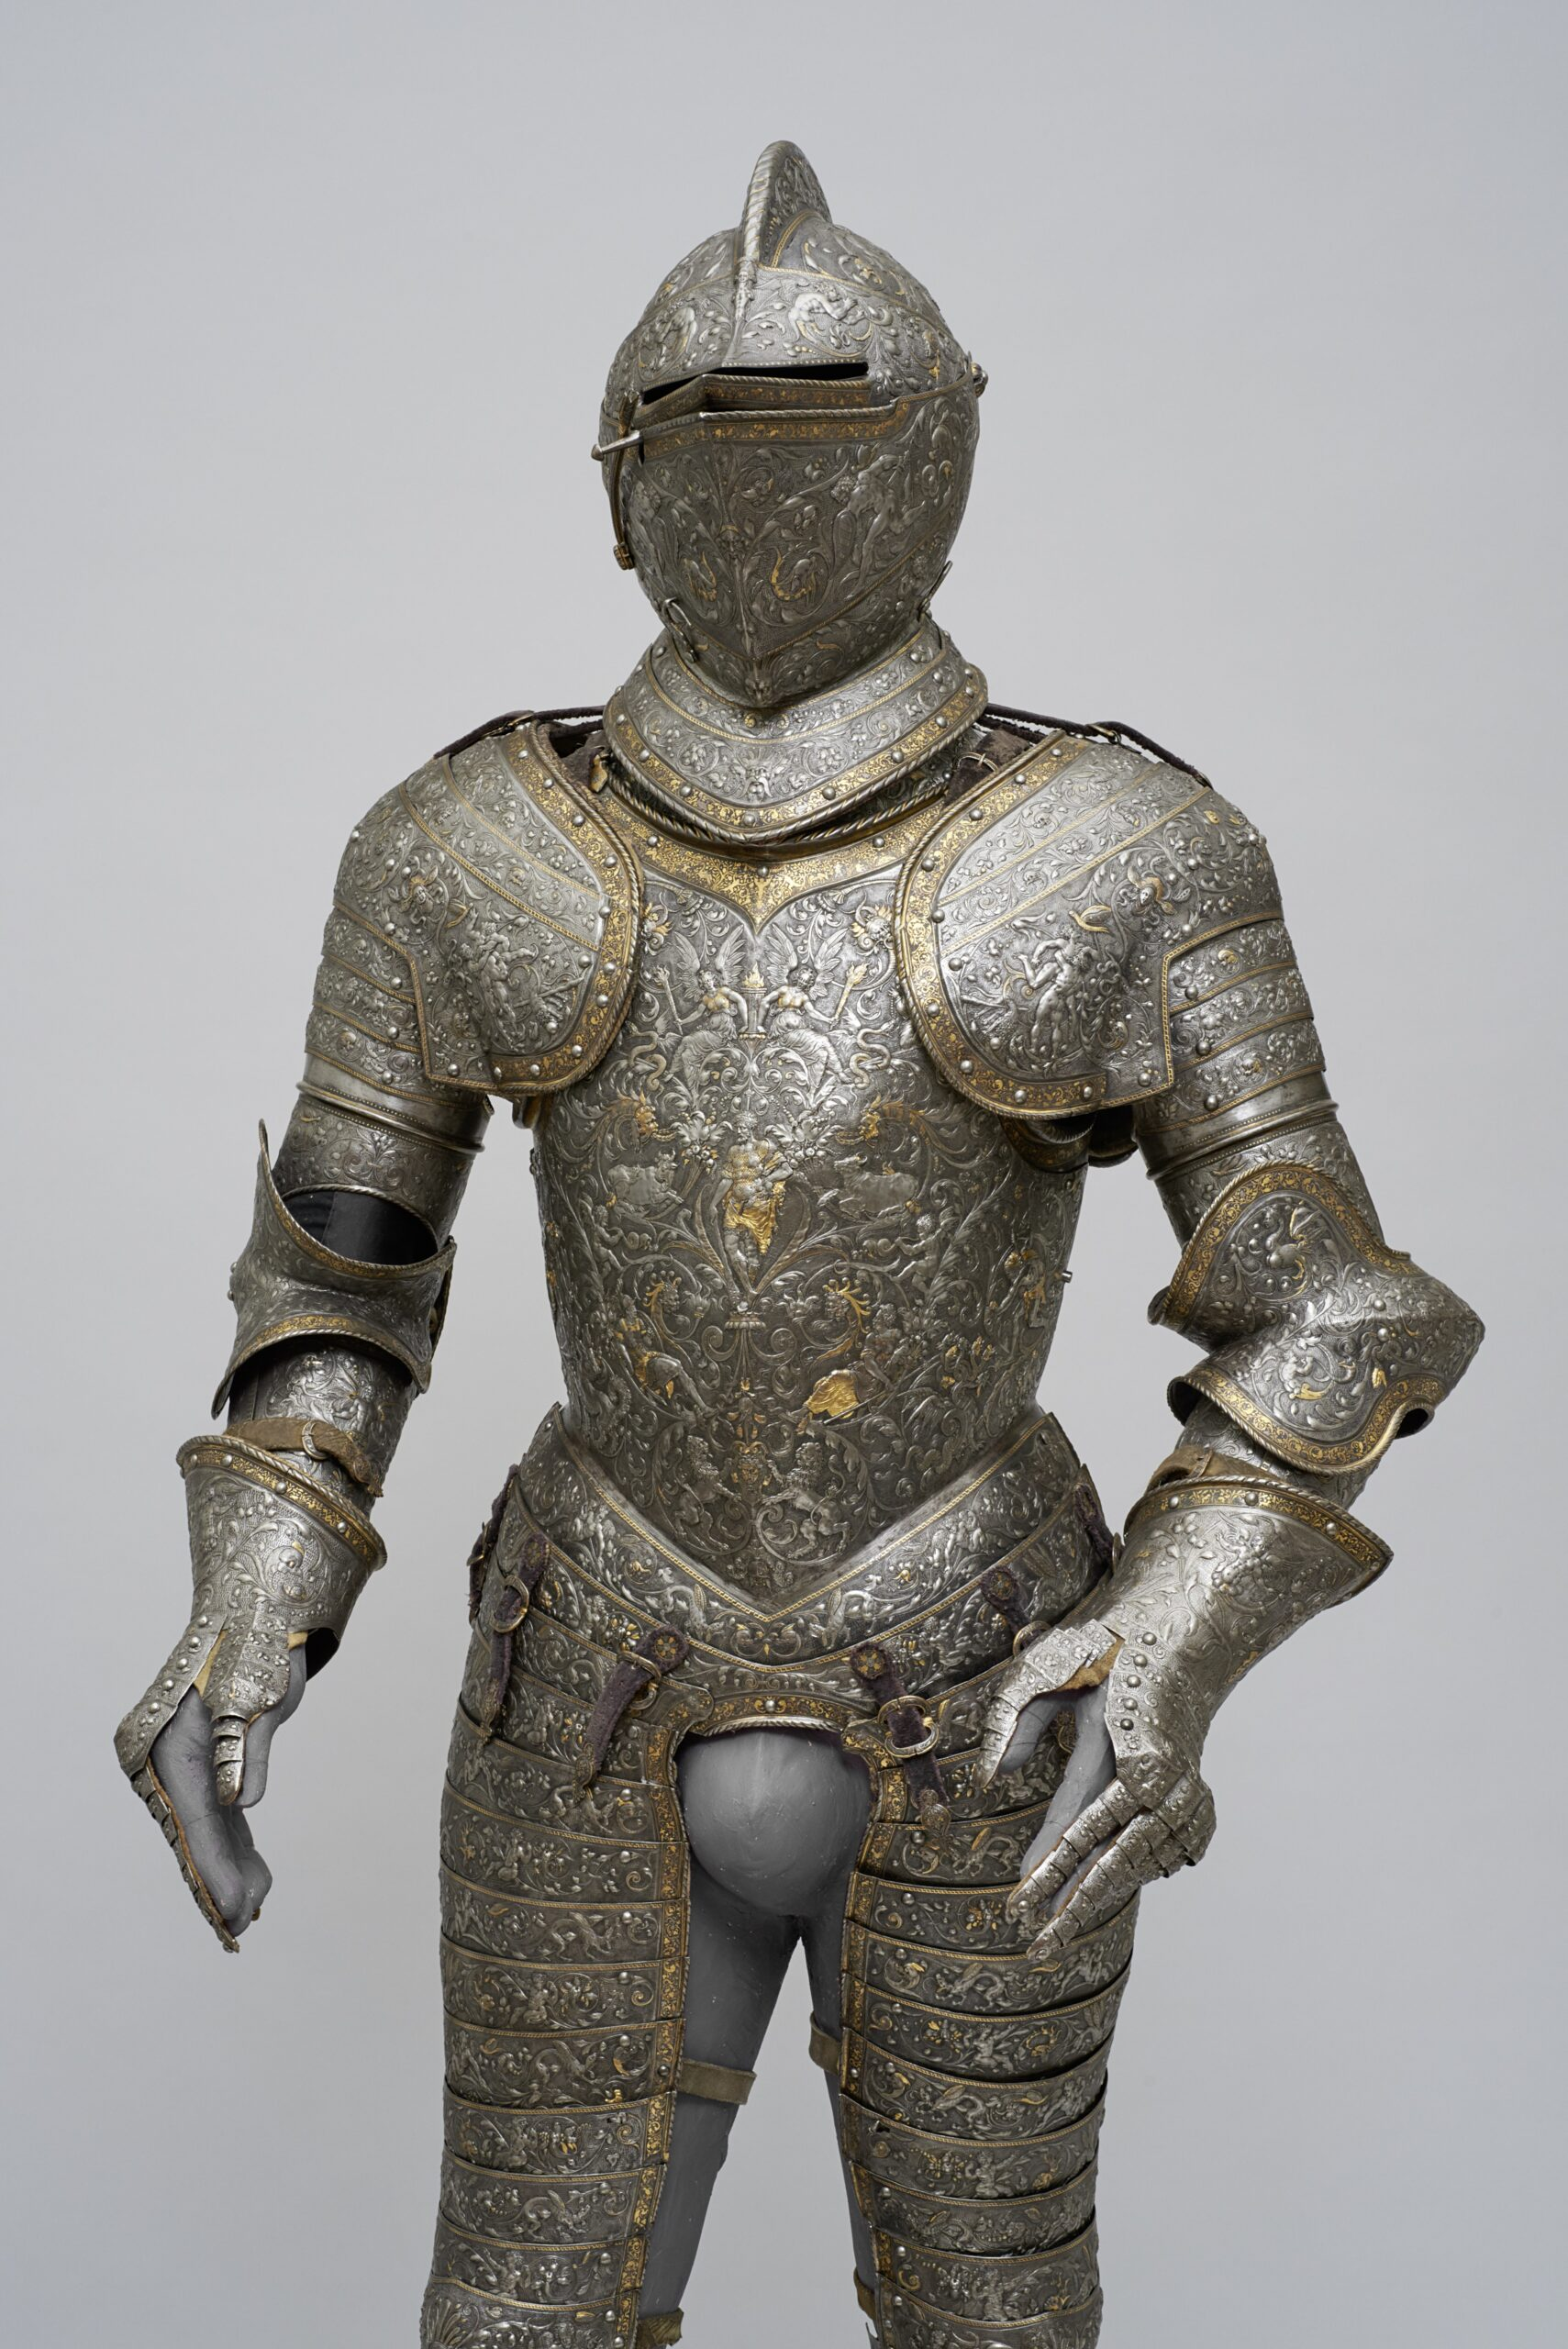 Fig. 1: The so-called Hercules Armor of King (Emperor) Maximilian II (1527-1576), Franco-Flemish, ca. 1555/60 Kunsthistorisches Museum, Vienna